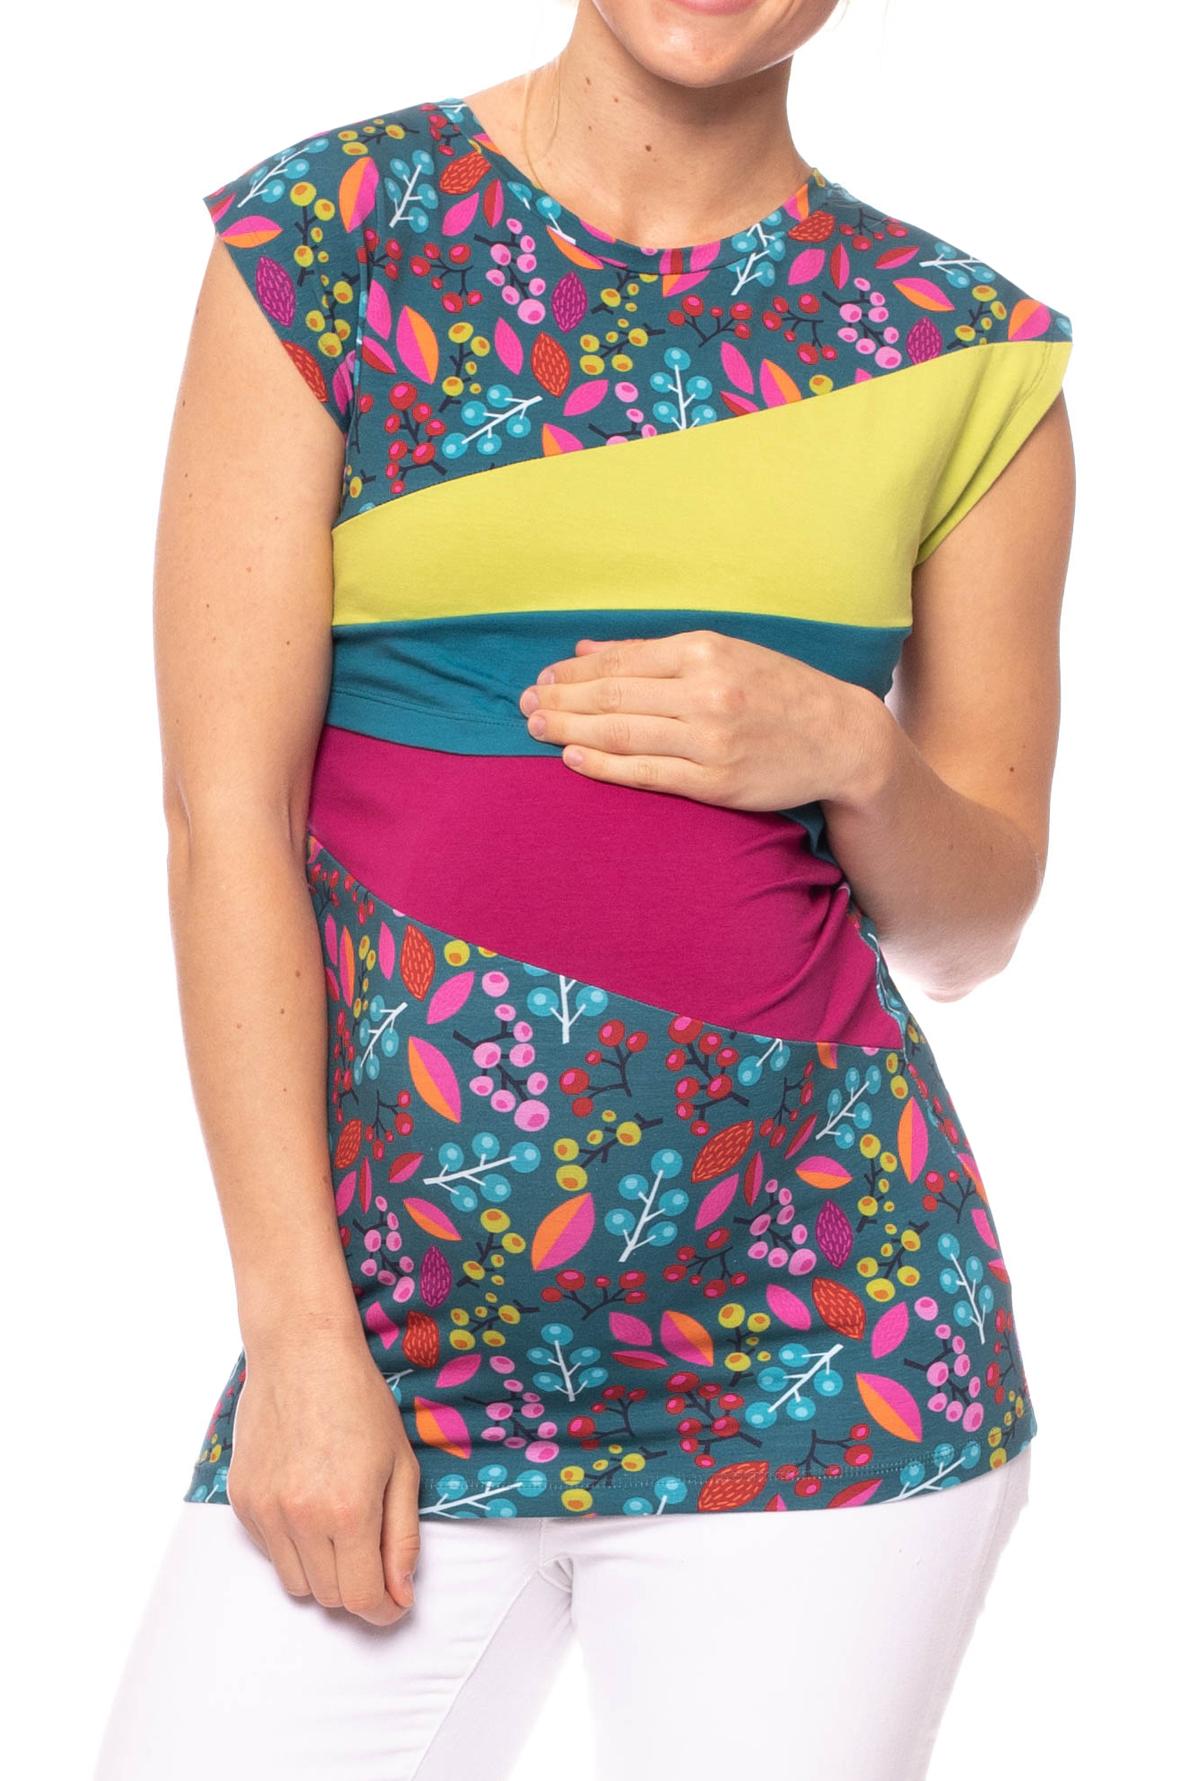 Smallshow Stillshirt Kurz/ärmlige gestreifte Lift-up-Hemden f/ür stillende Frauen